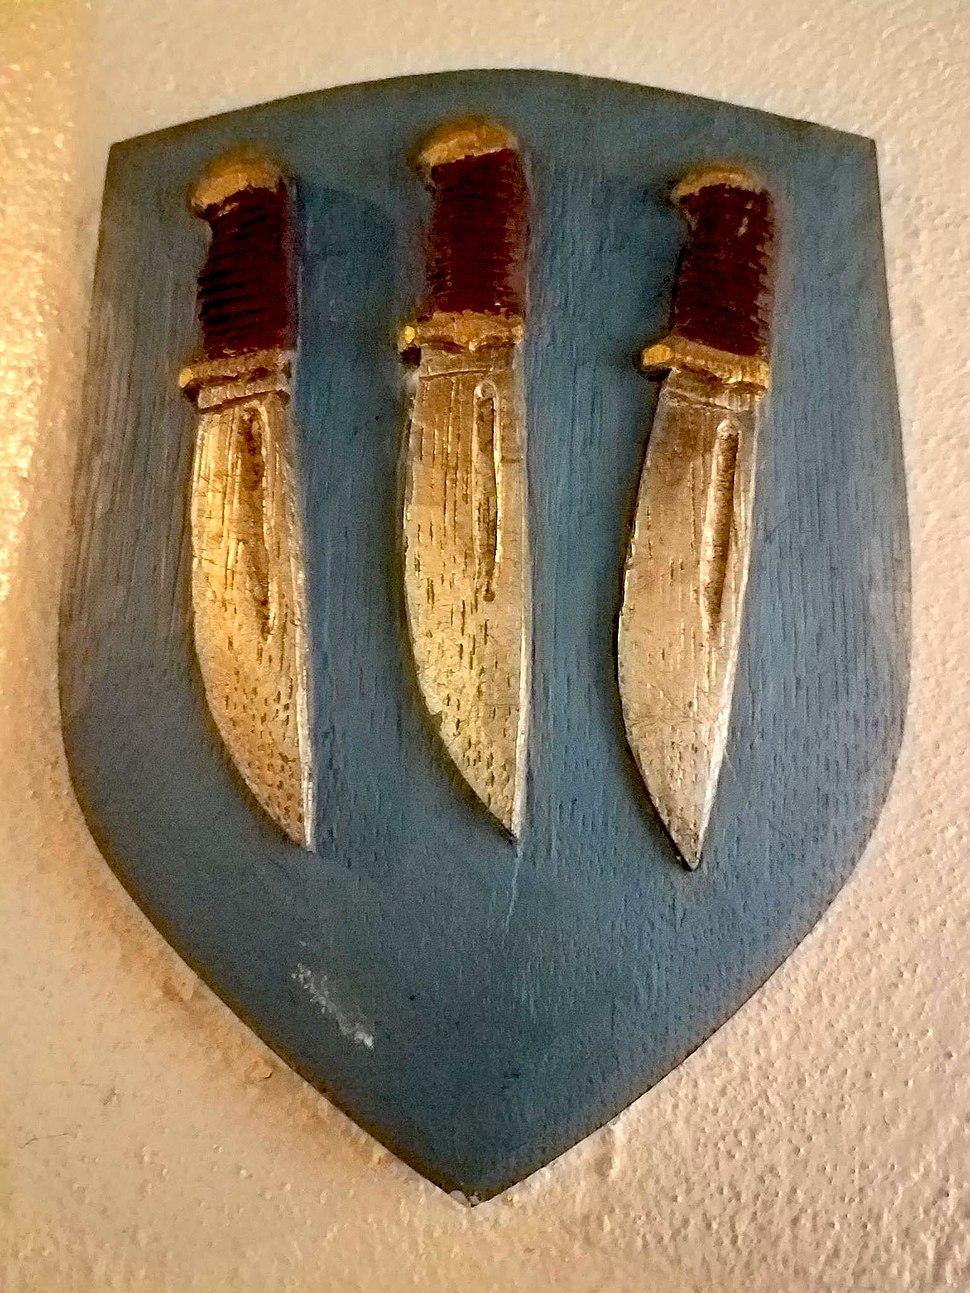 Shield showing three flaying knives, symbol of St. Bartholomew